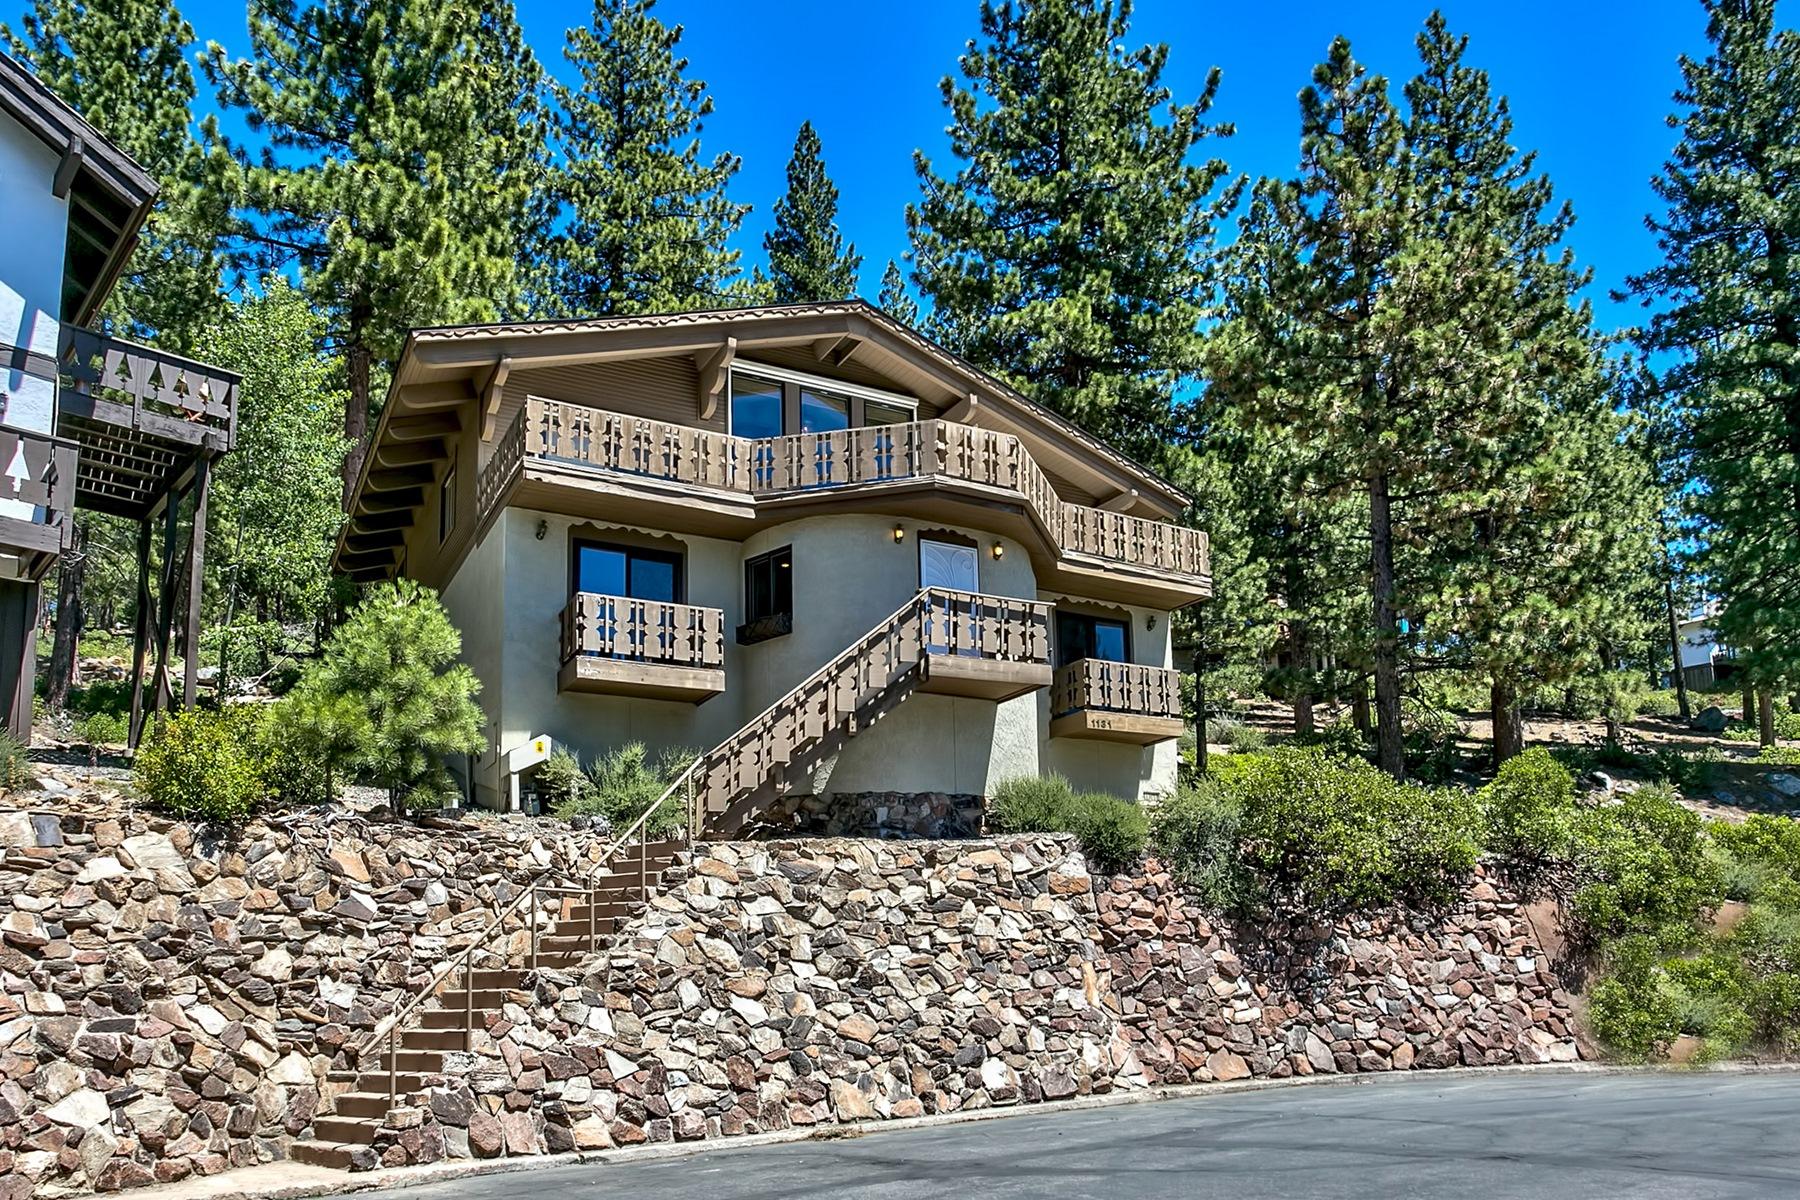 独户住宅 为 销售 在 1131 Lucerne Way Incline Village, 内华达州, 89451 Lake Tahoe, 美国